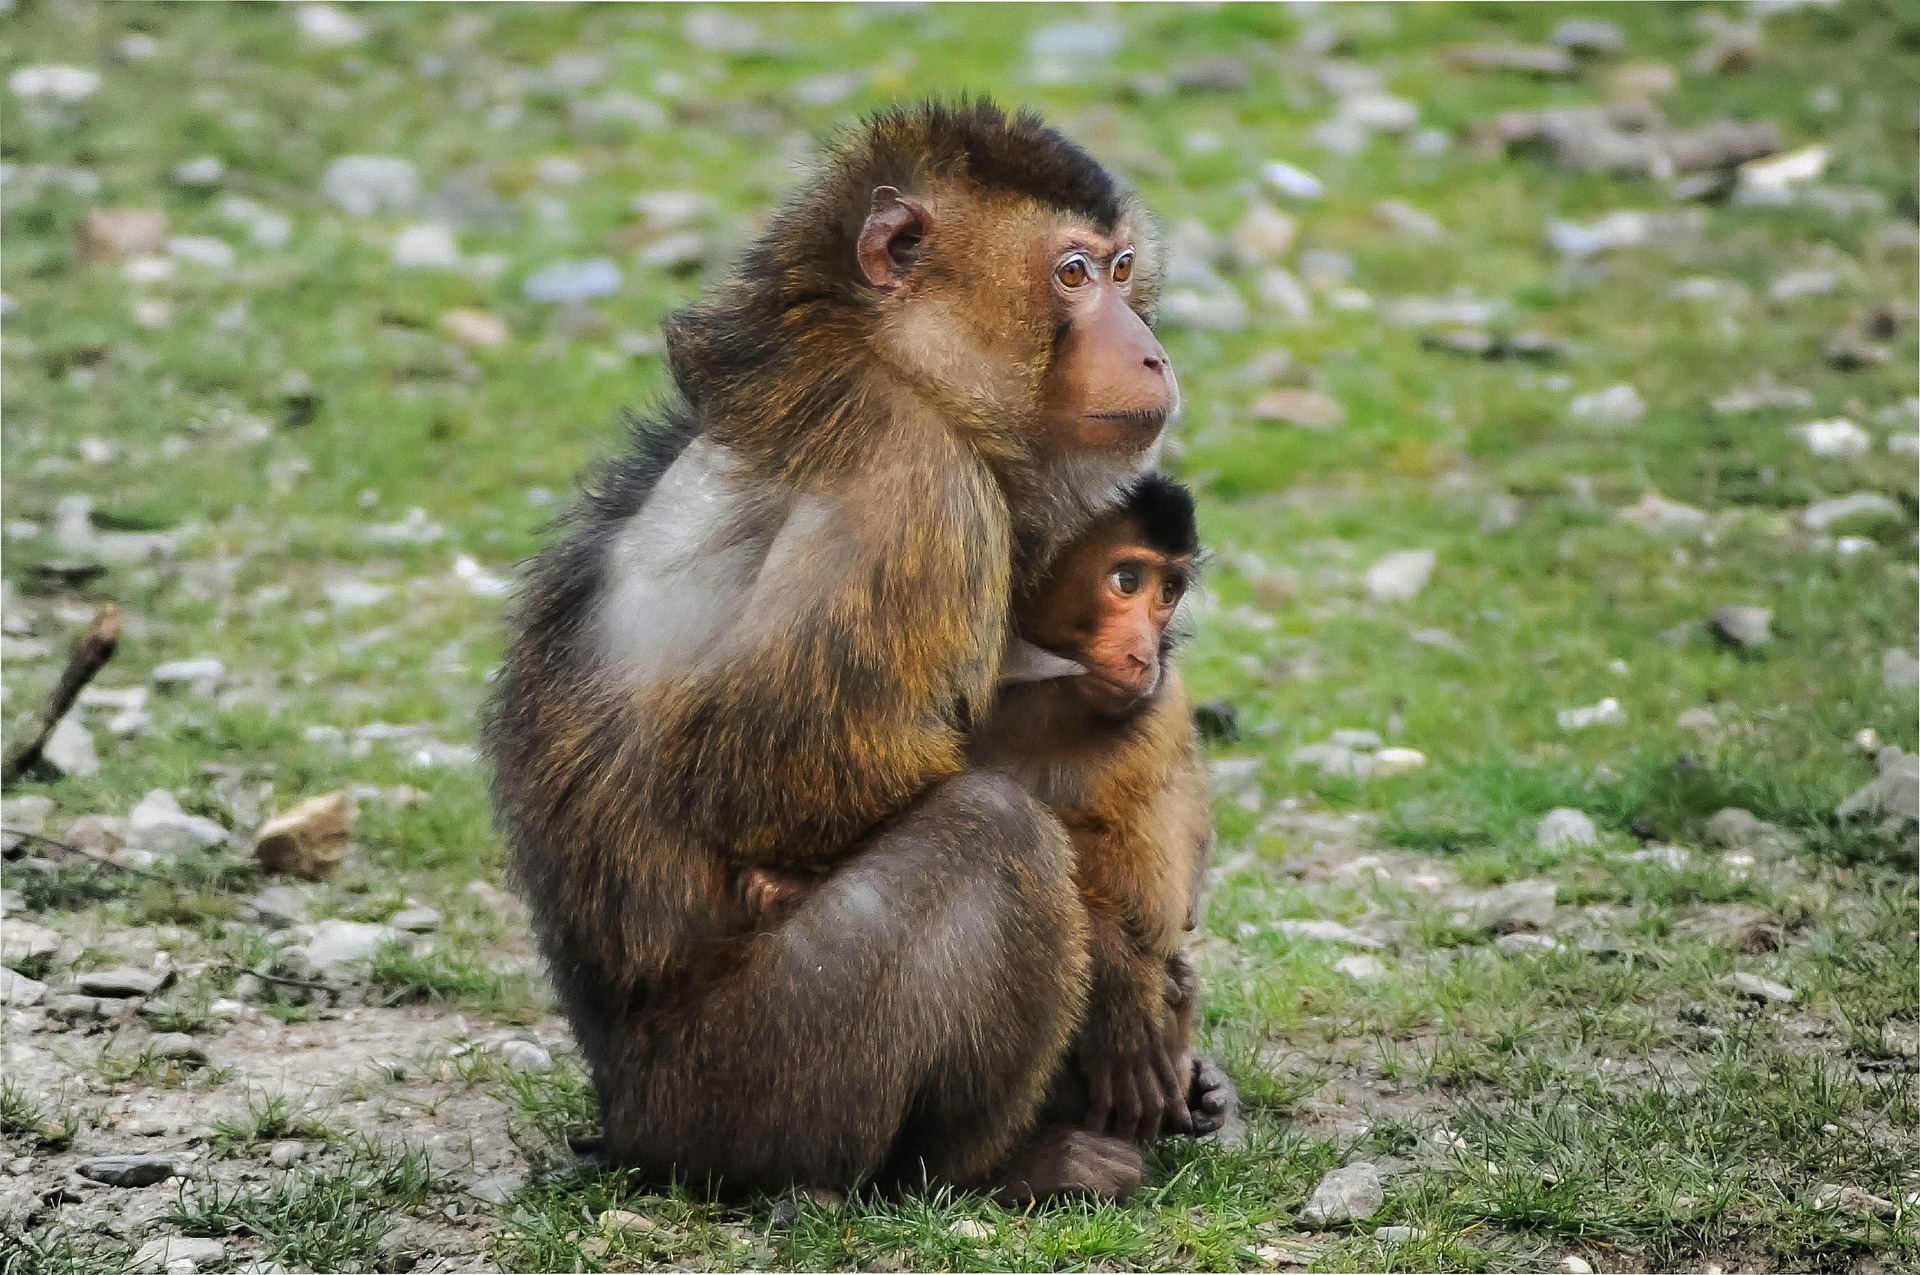 Barbary apes.